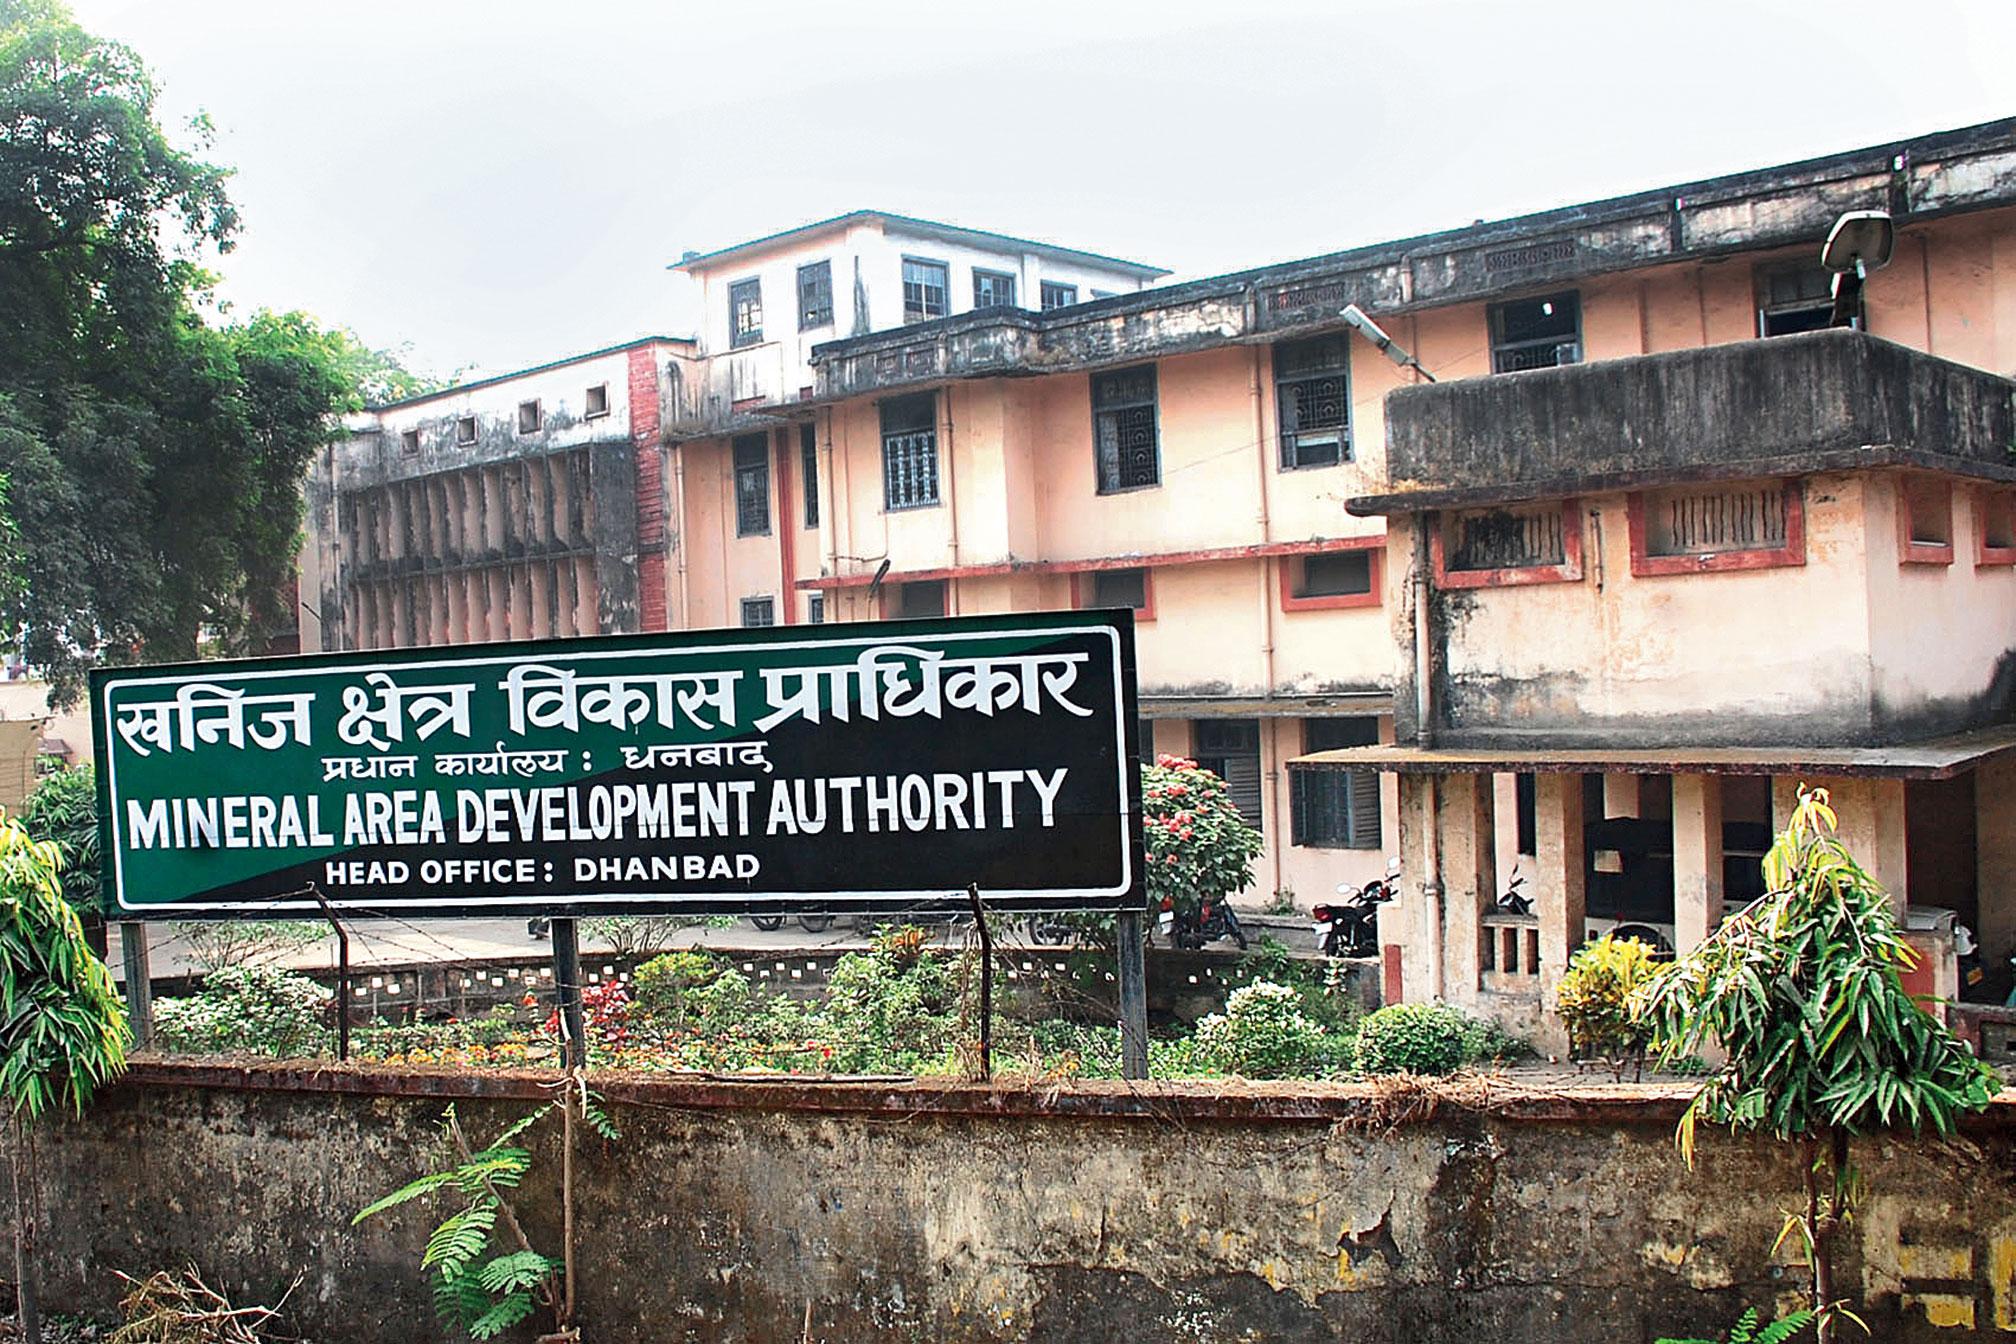 Mada head office in Dhanbad on Sunday.